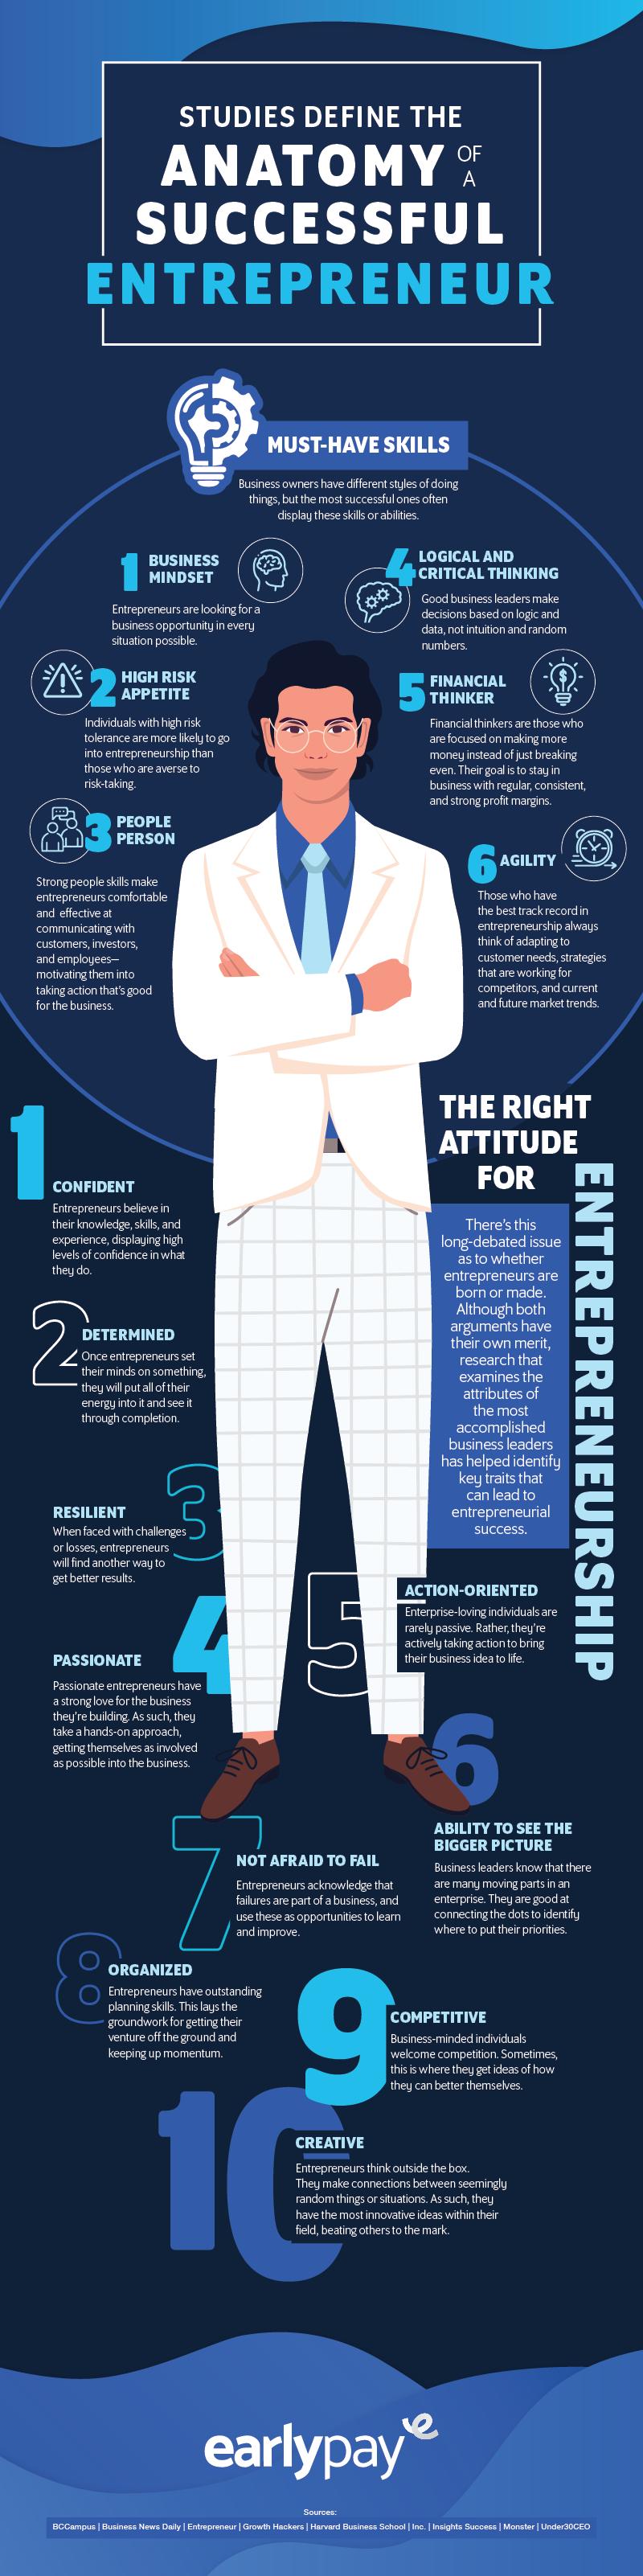 Studies Define the Anatomy of a Successful Entrepreneur_rev